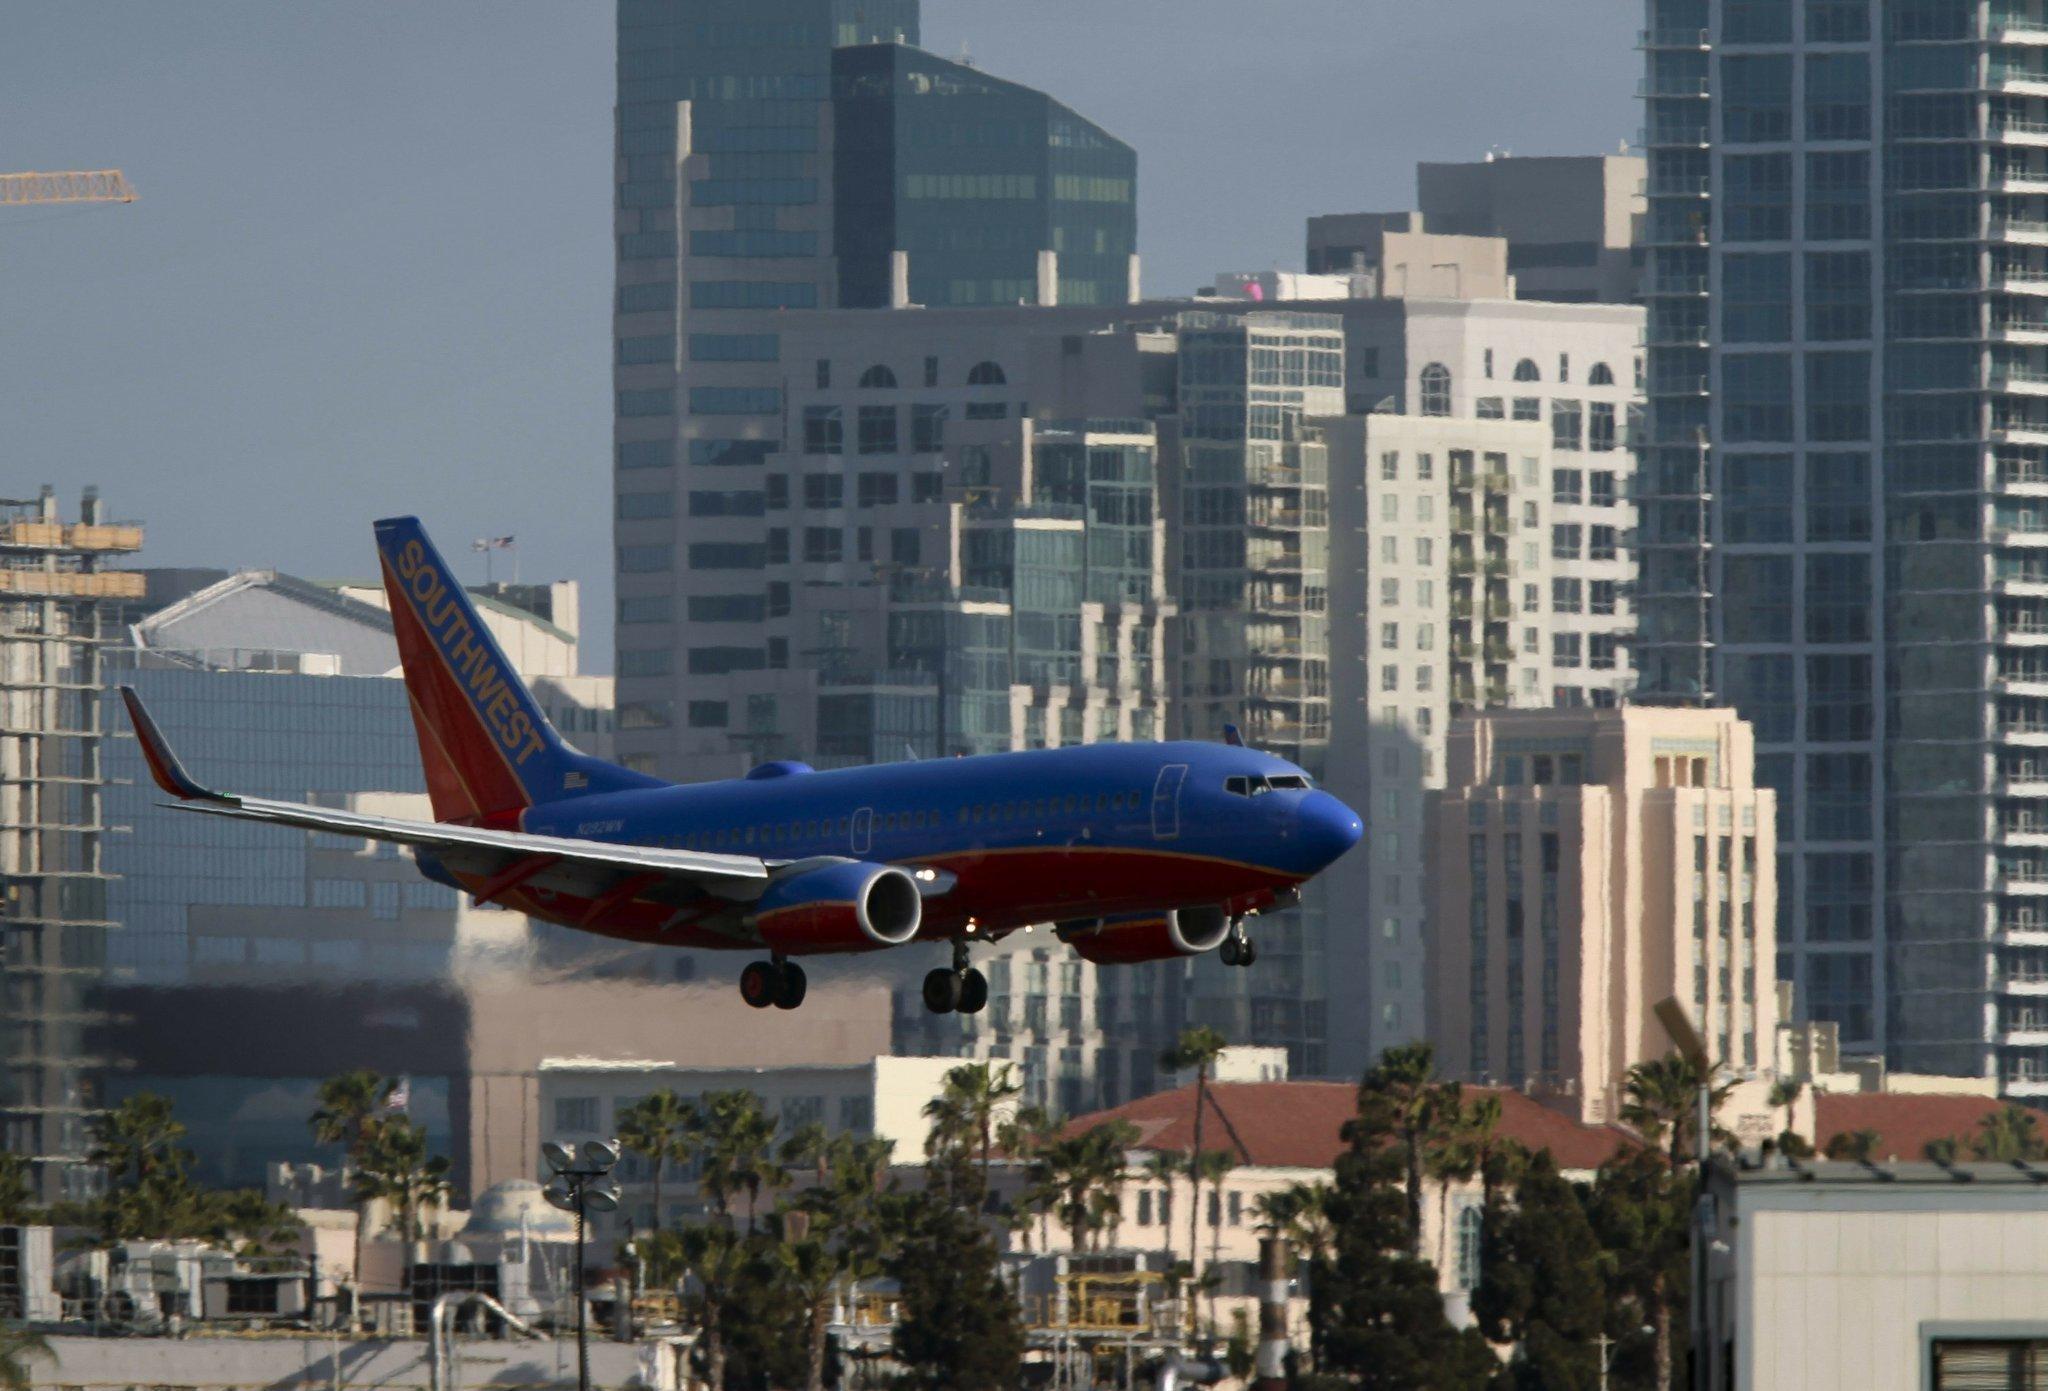 Southwest Flight From San Antonio To Orlando Makes